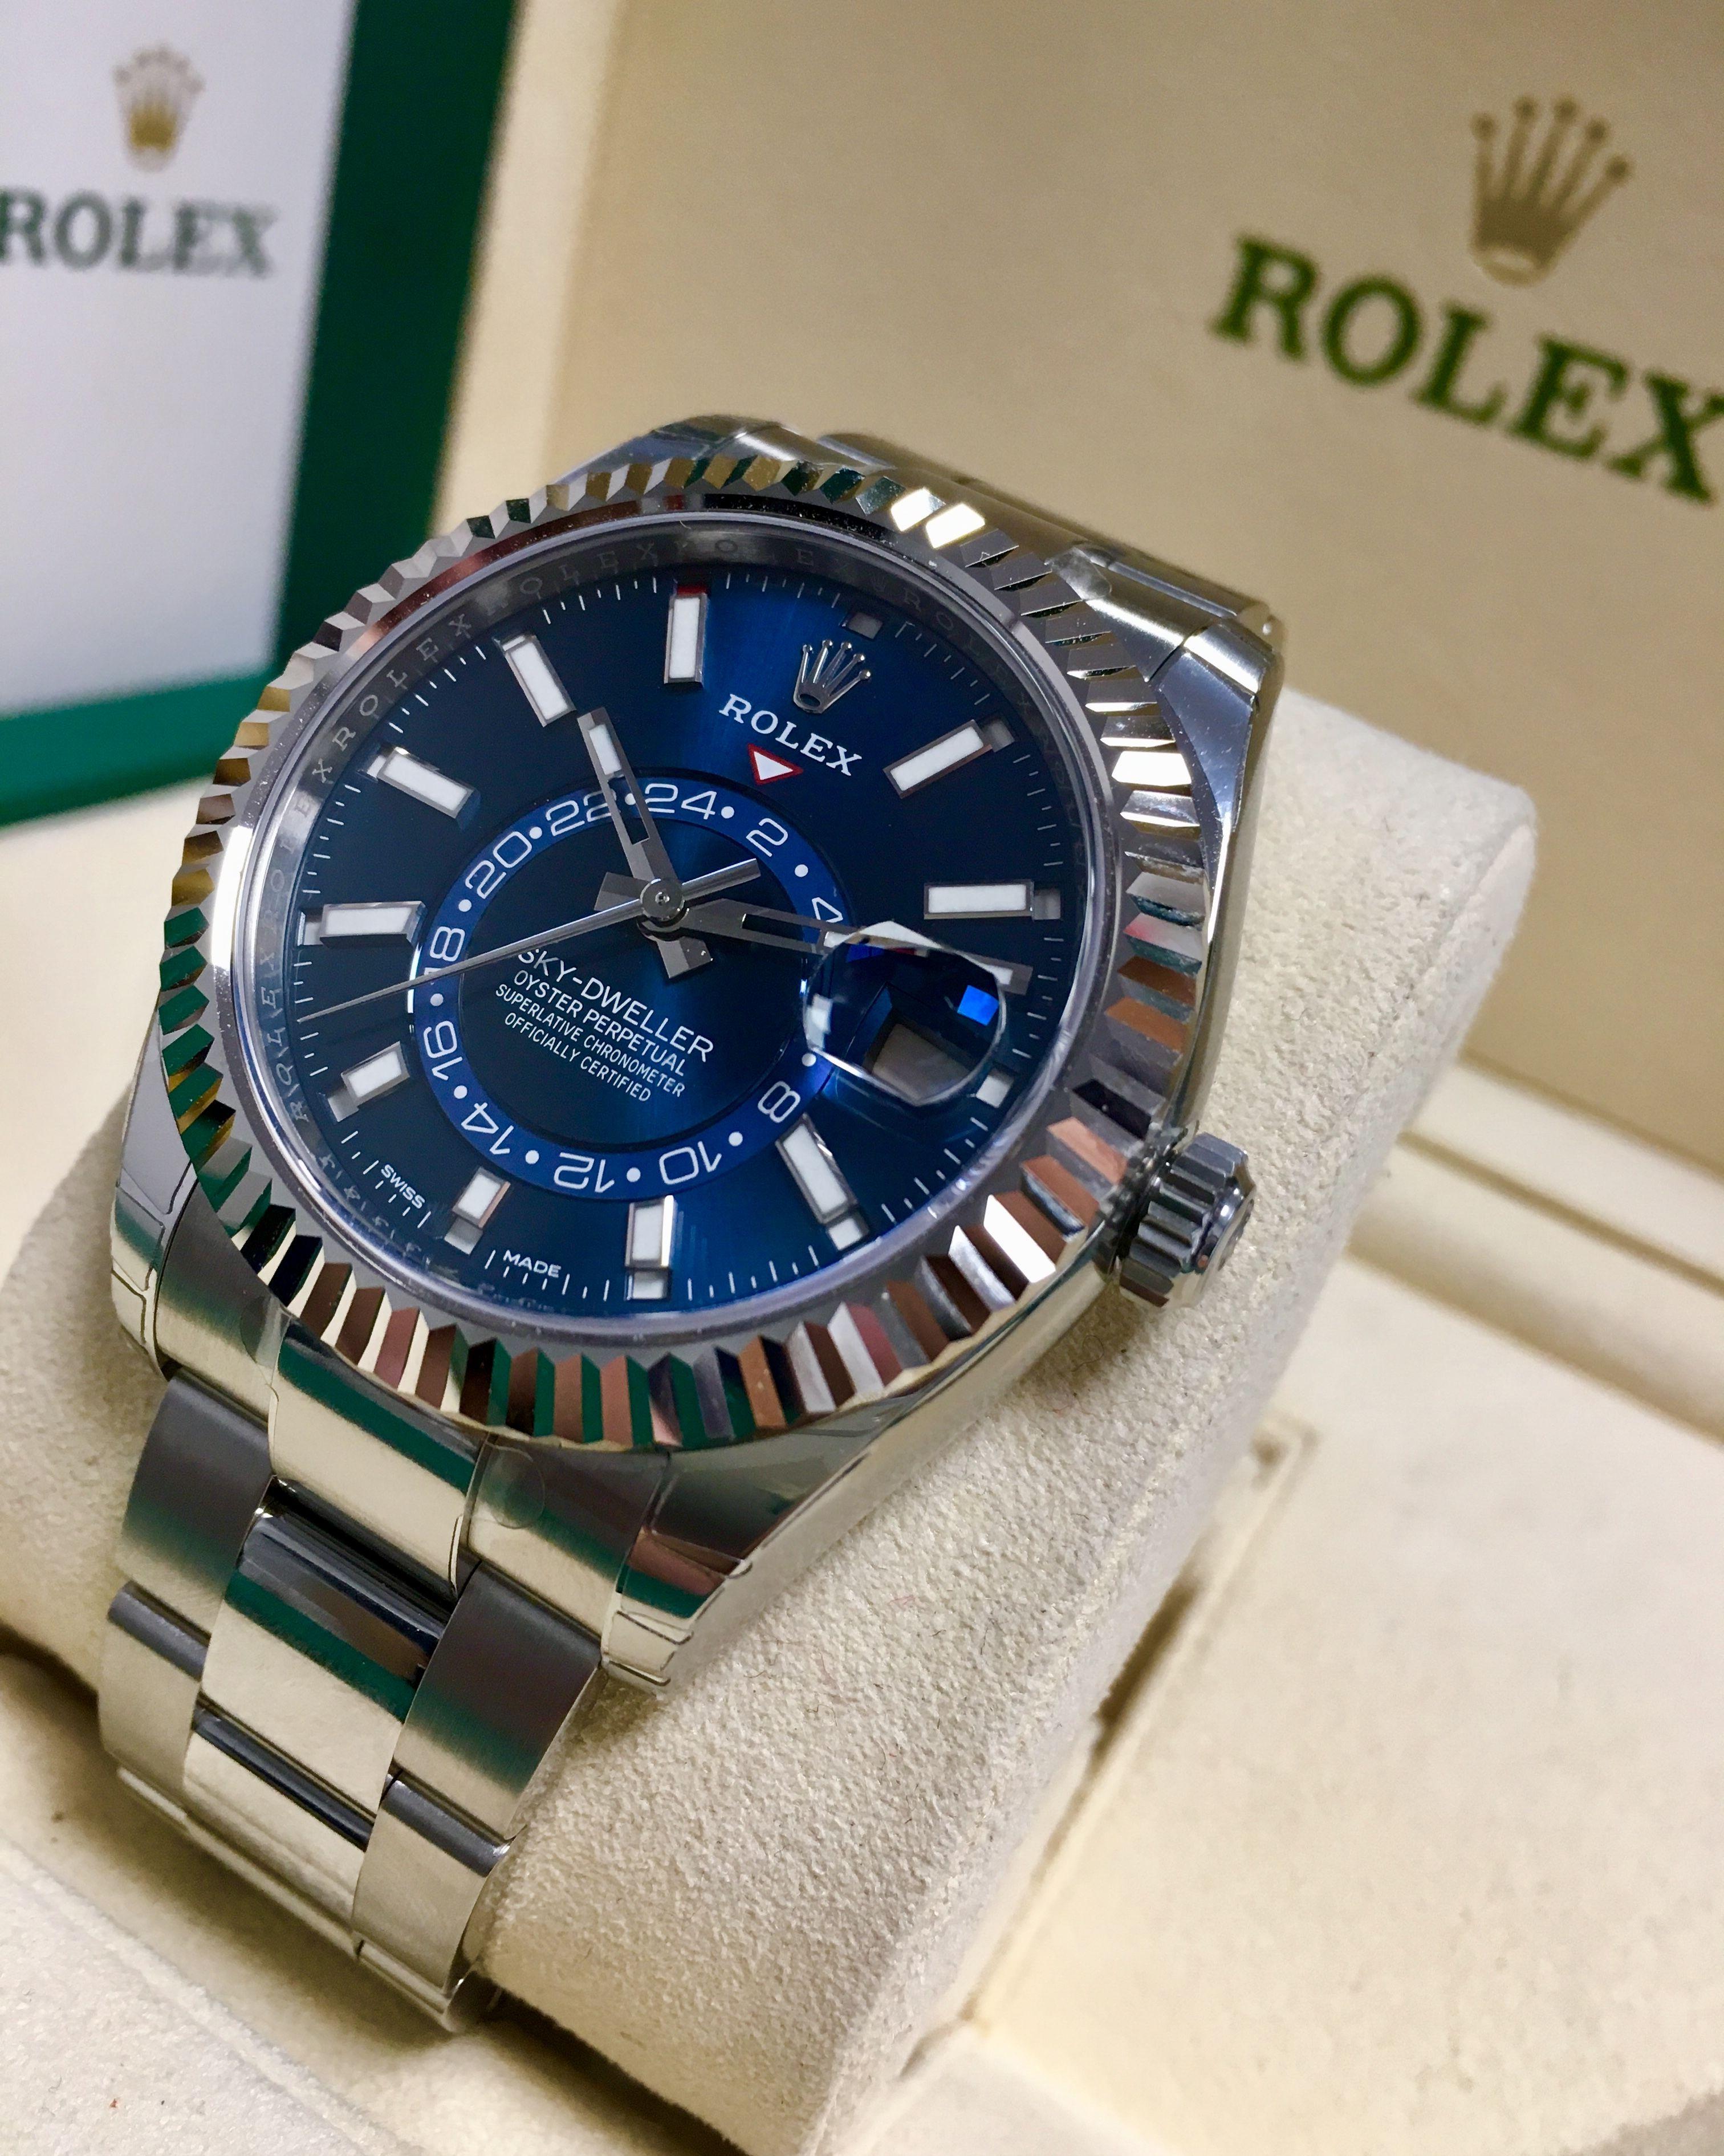 3719ac53c Rolex Sky-Dweller Stainless Steel Blue Dial 326934 | WATCH DESIGN ...